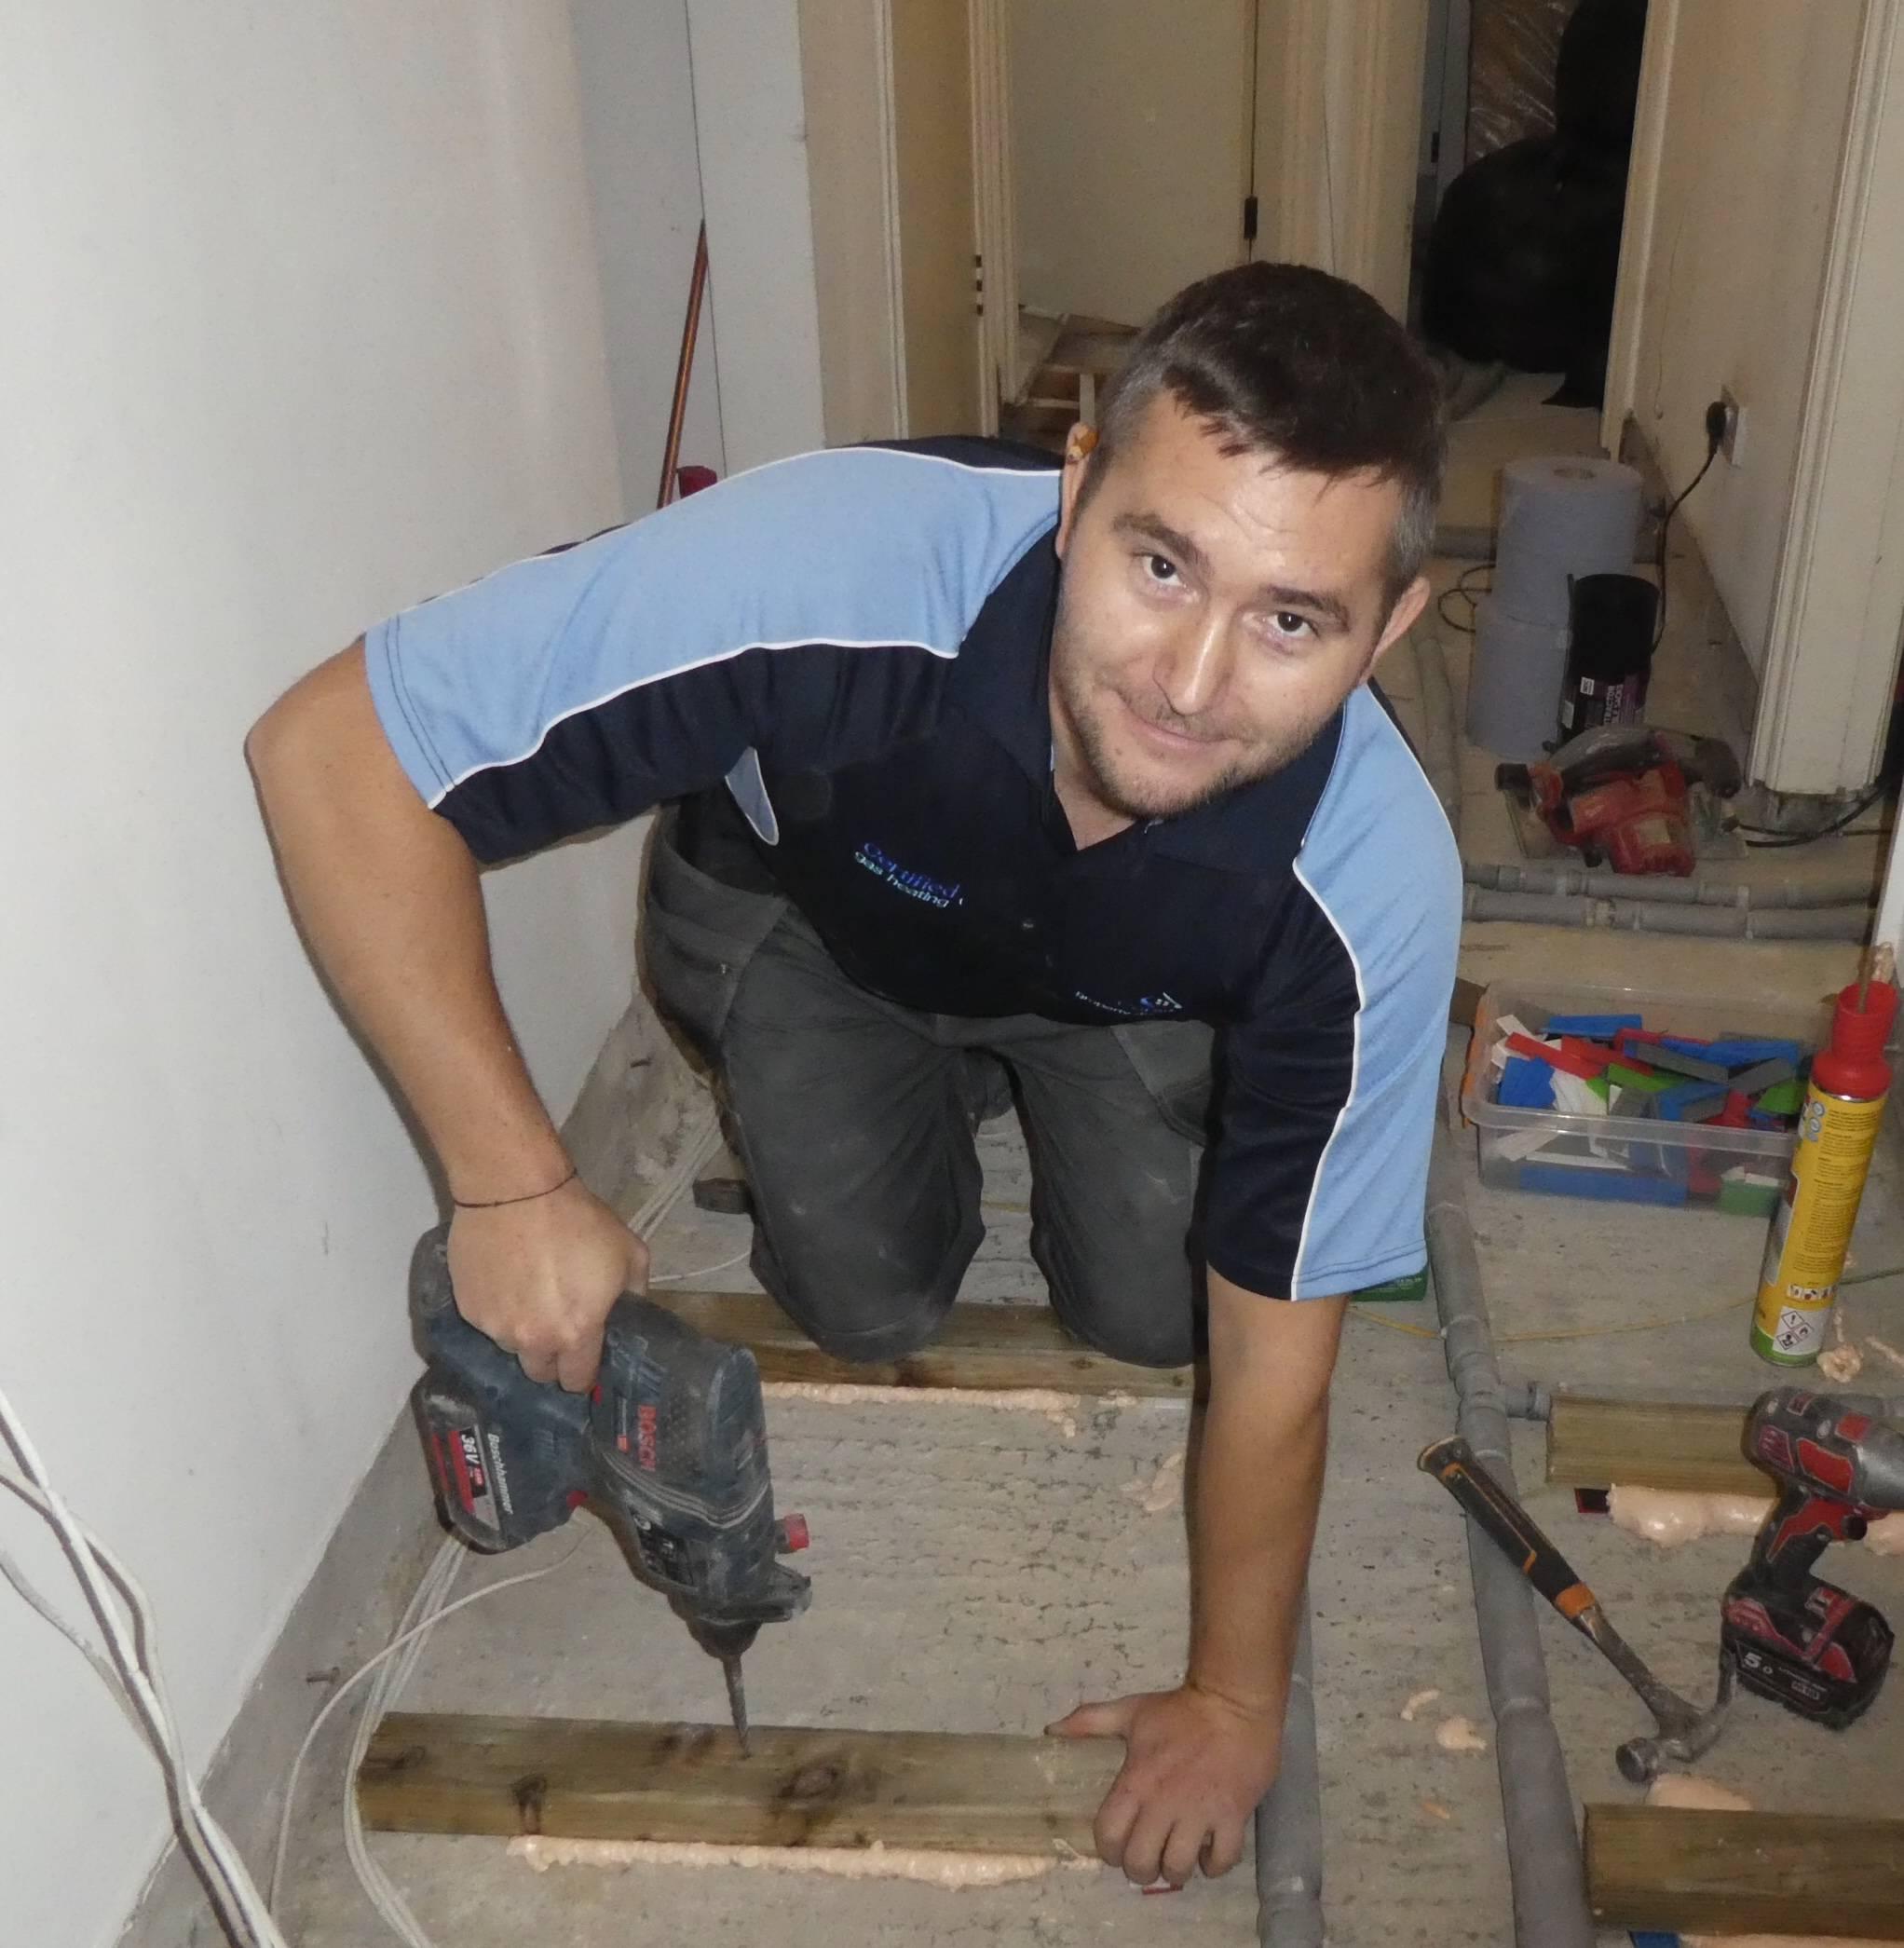 https://certifiedgasheating.co.uk/wp-content/uploads/2020/01/IMG_0026-1-1.jpg